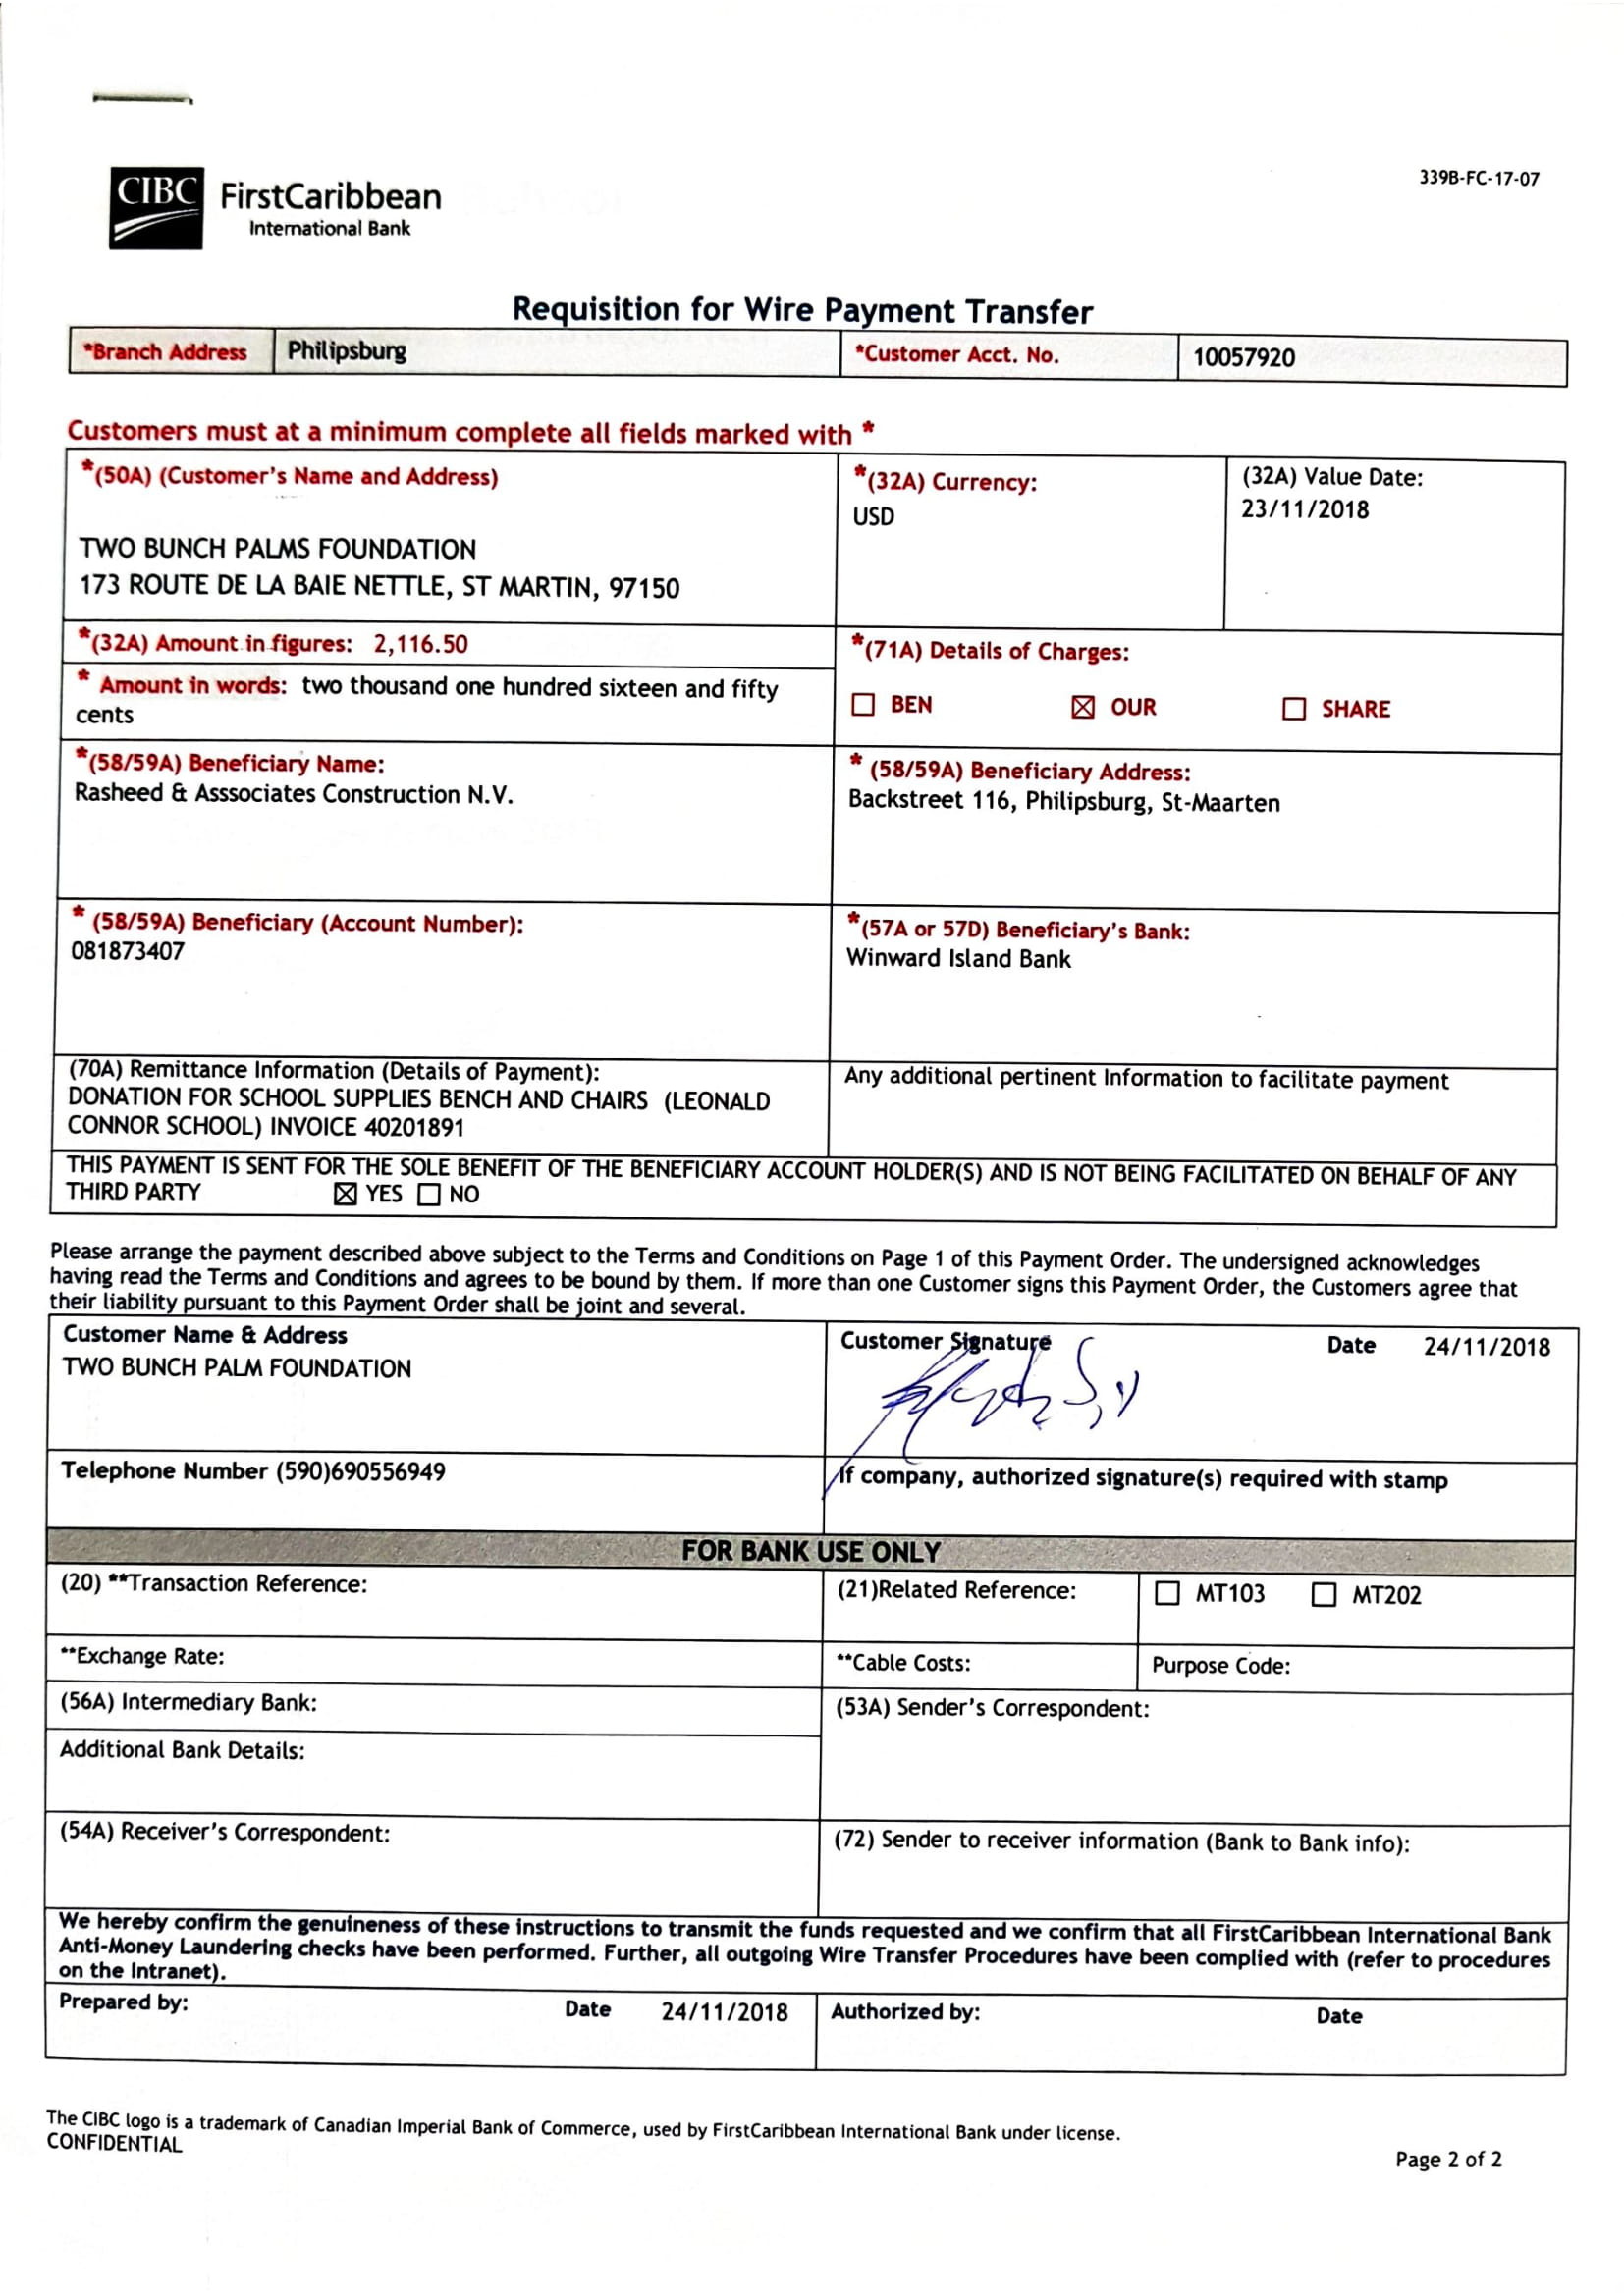 Payement To Rasheed & Associate for Léonard conner school-1.jpg